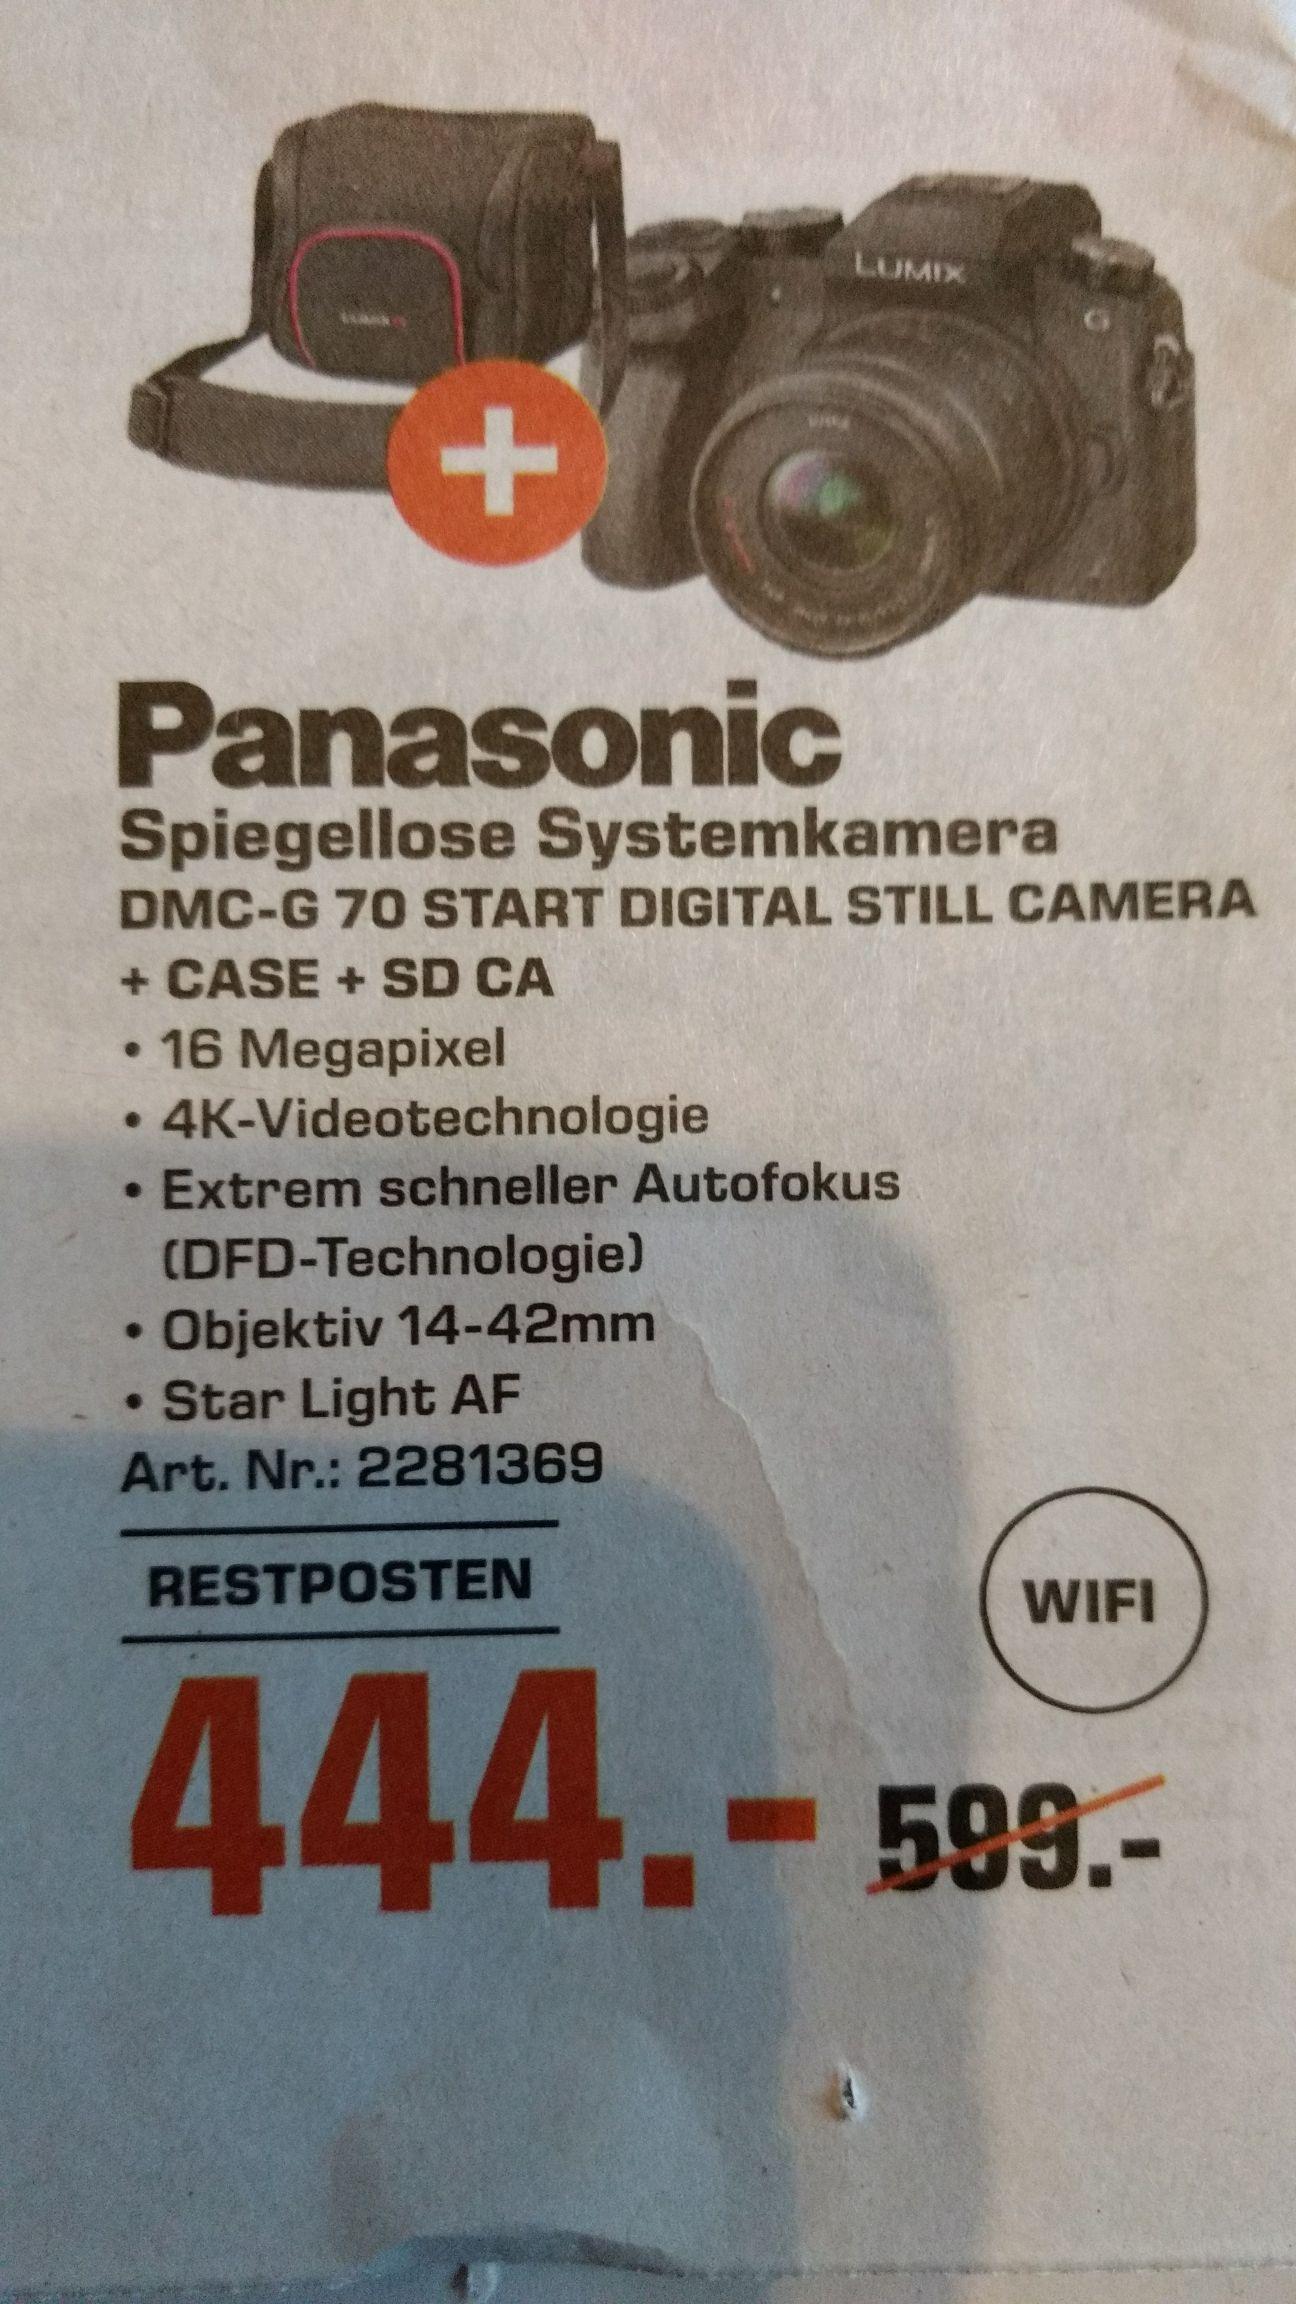 [Lokal - Saturn Bochum] Panasonic DMC-G70 Systemkamera + 14-42 Kit + Tasche